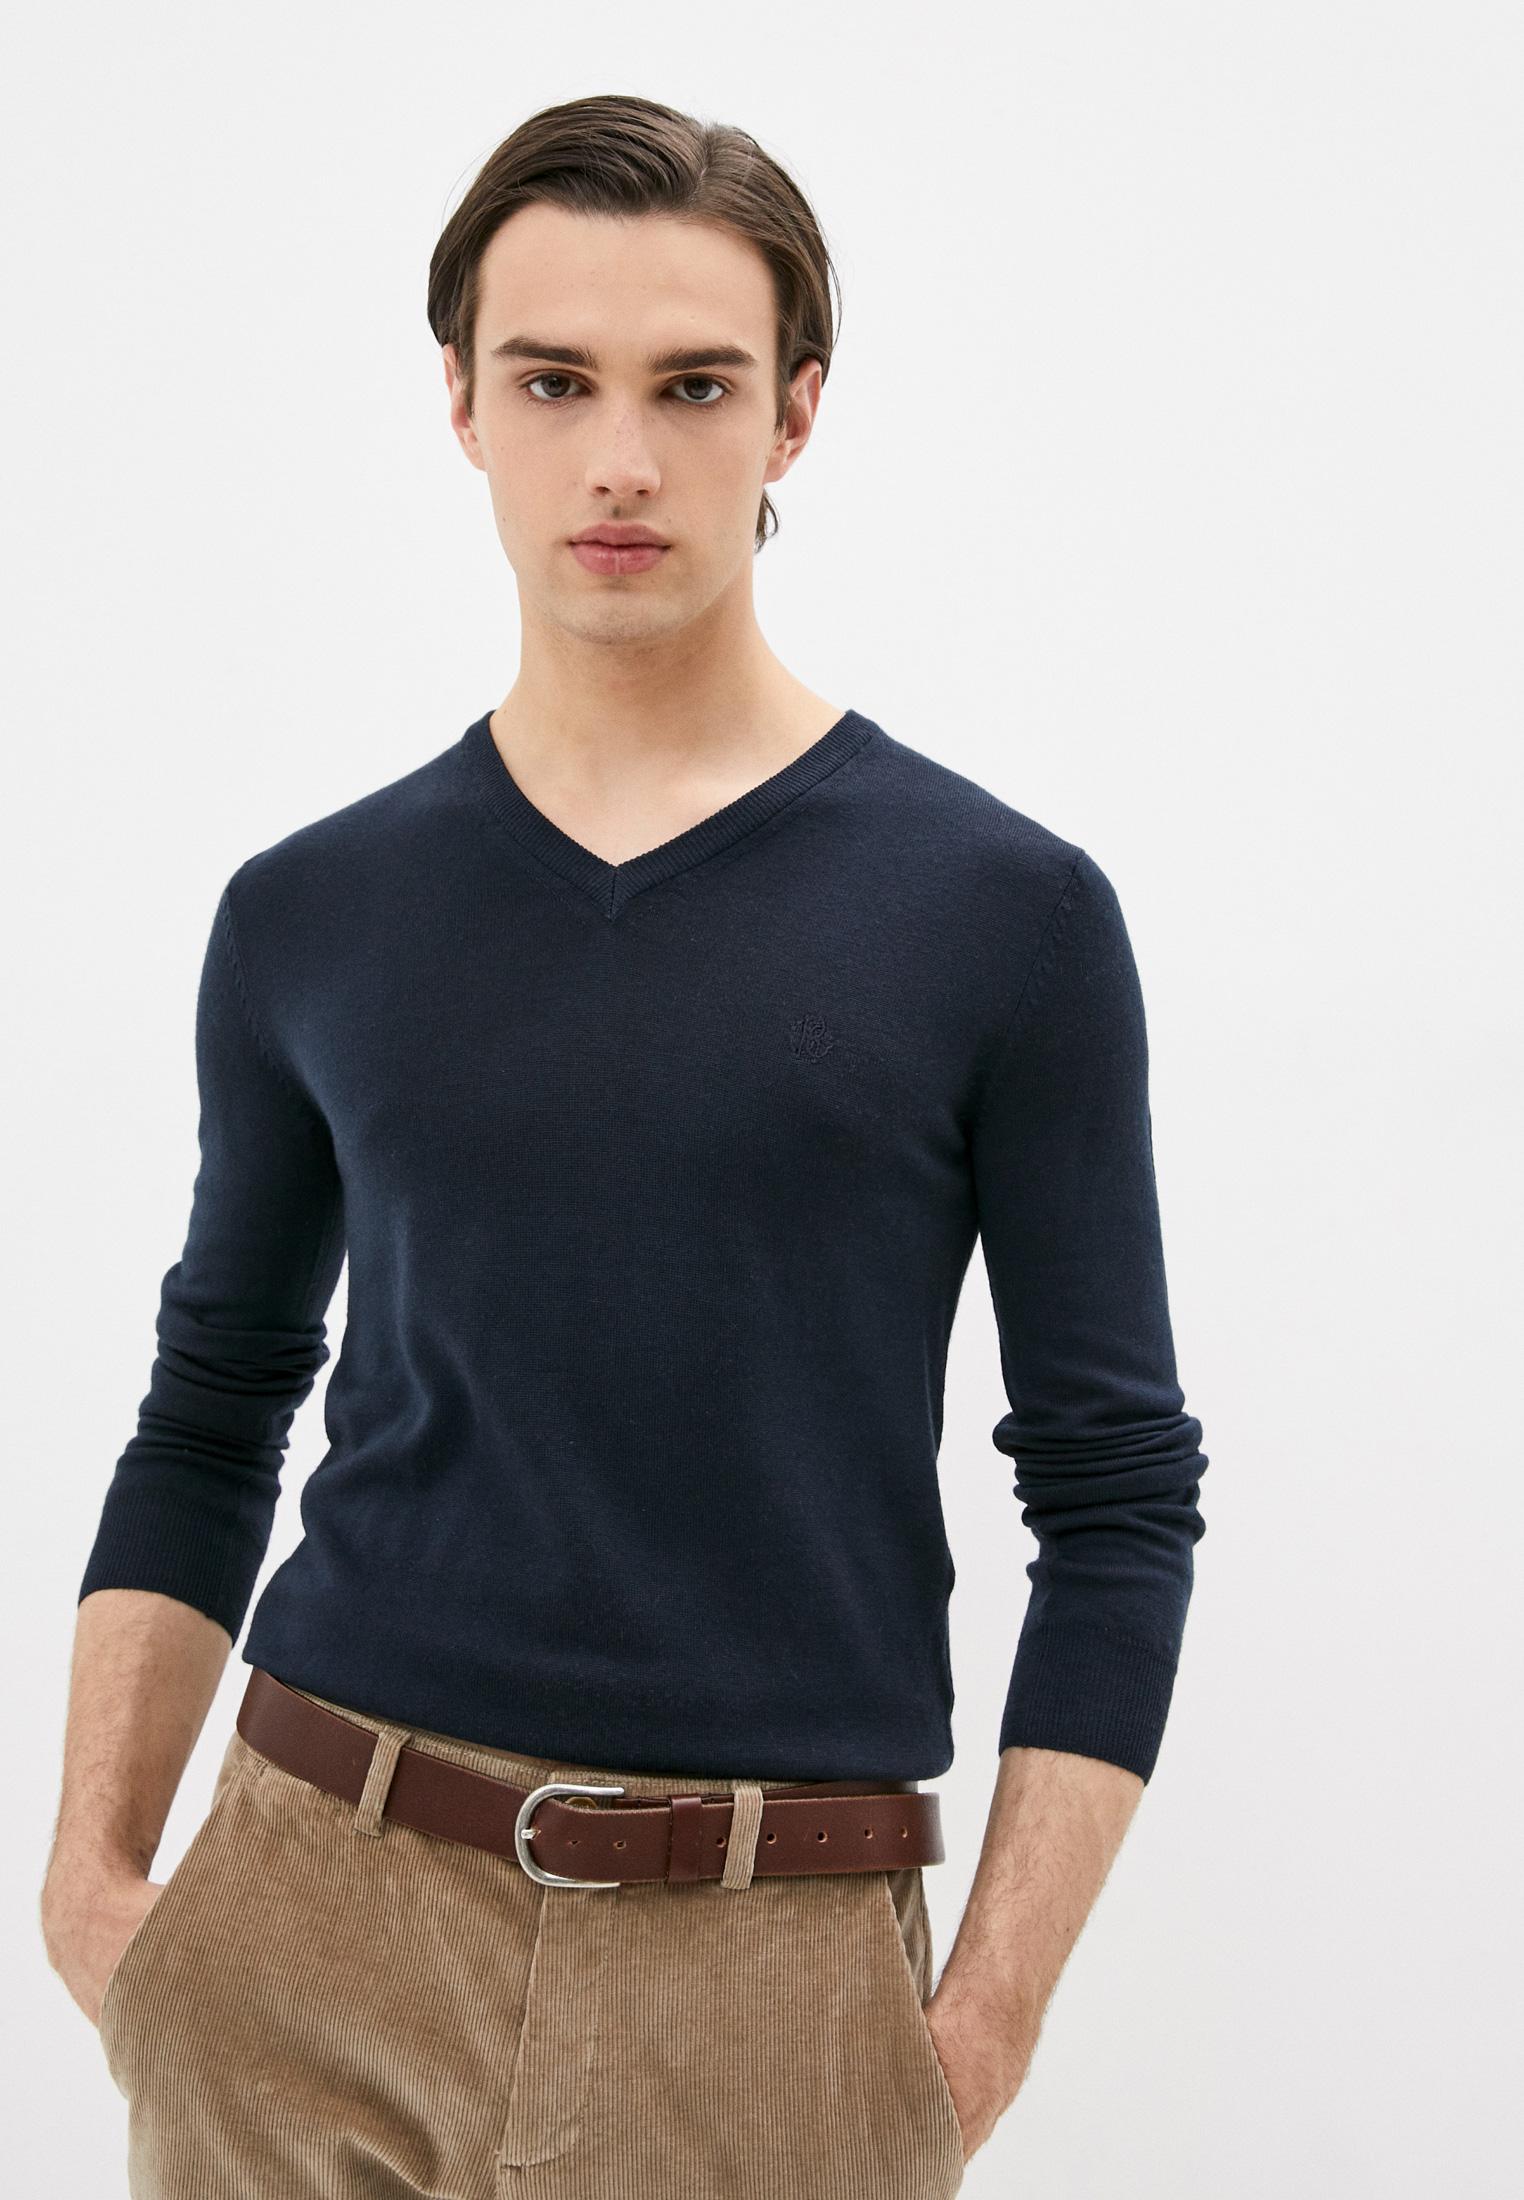 Пуловер Roberto Cavalli (Роберто Кавалли) HSM614A721